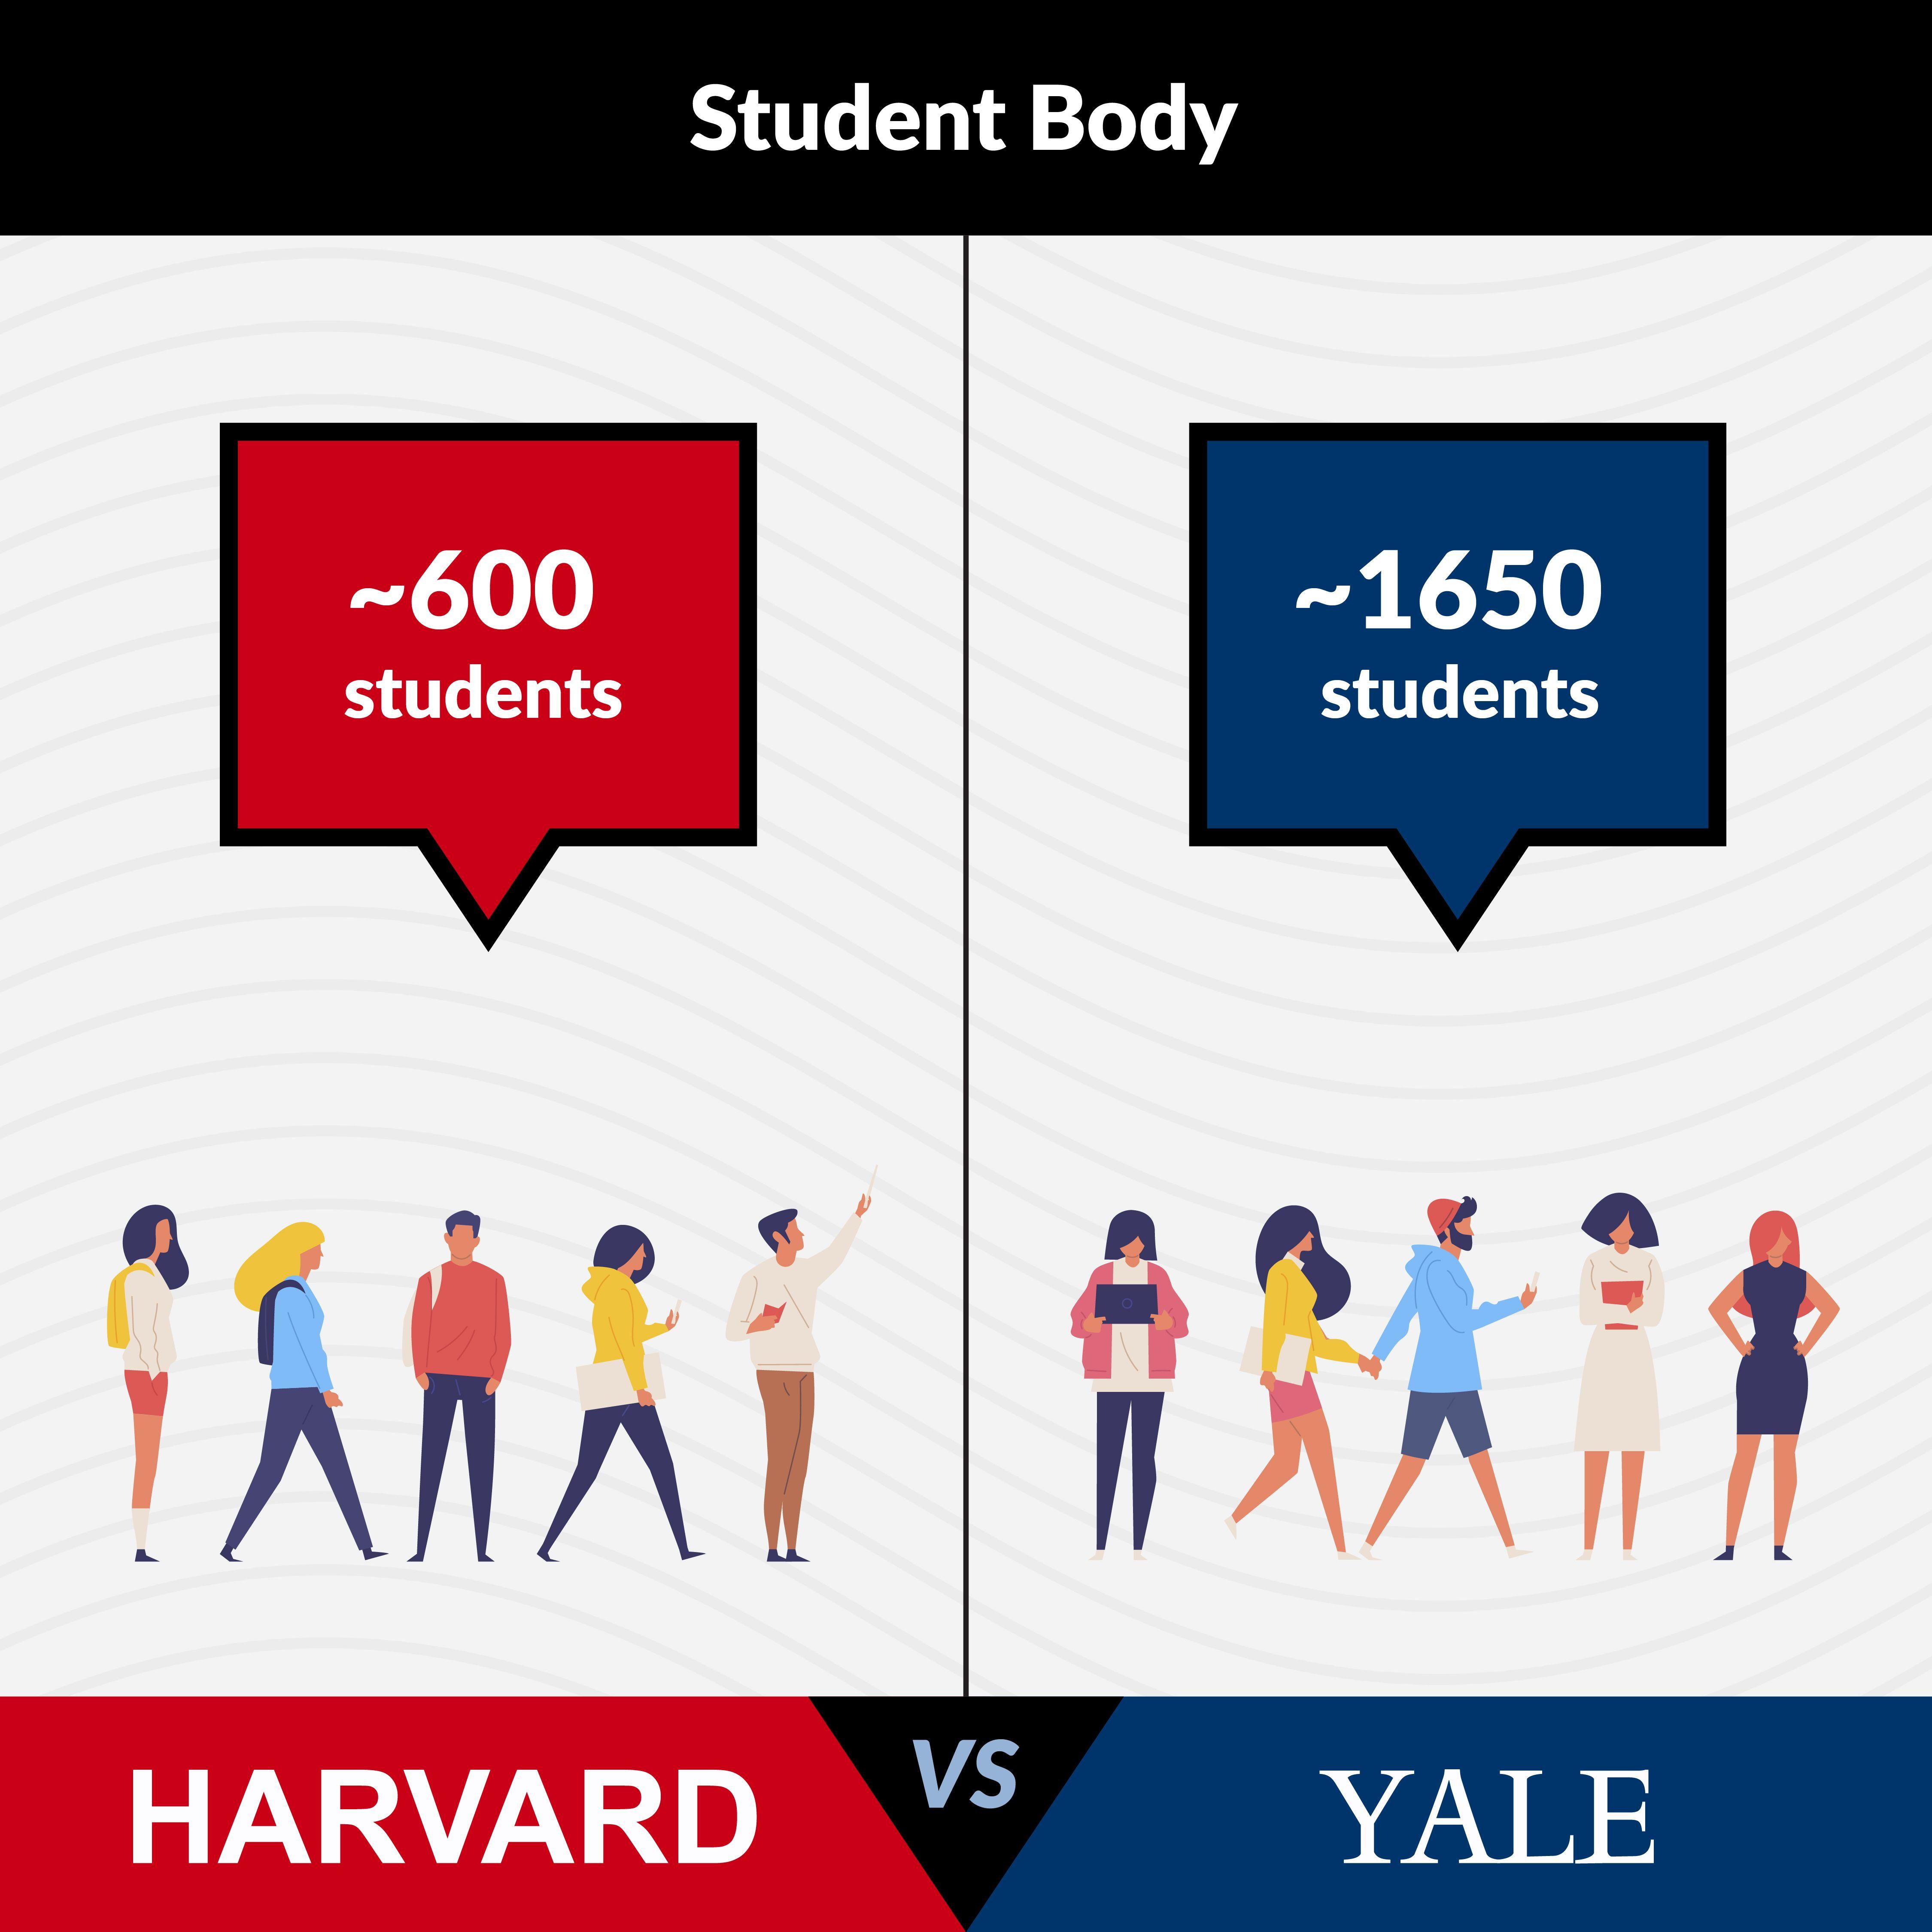 Harvard Law Vs Yale Law Student Body Student Body Harvard Law Yale